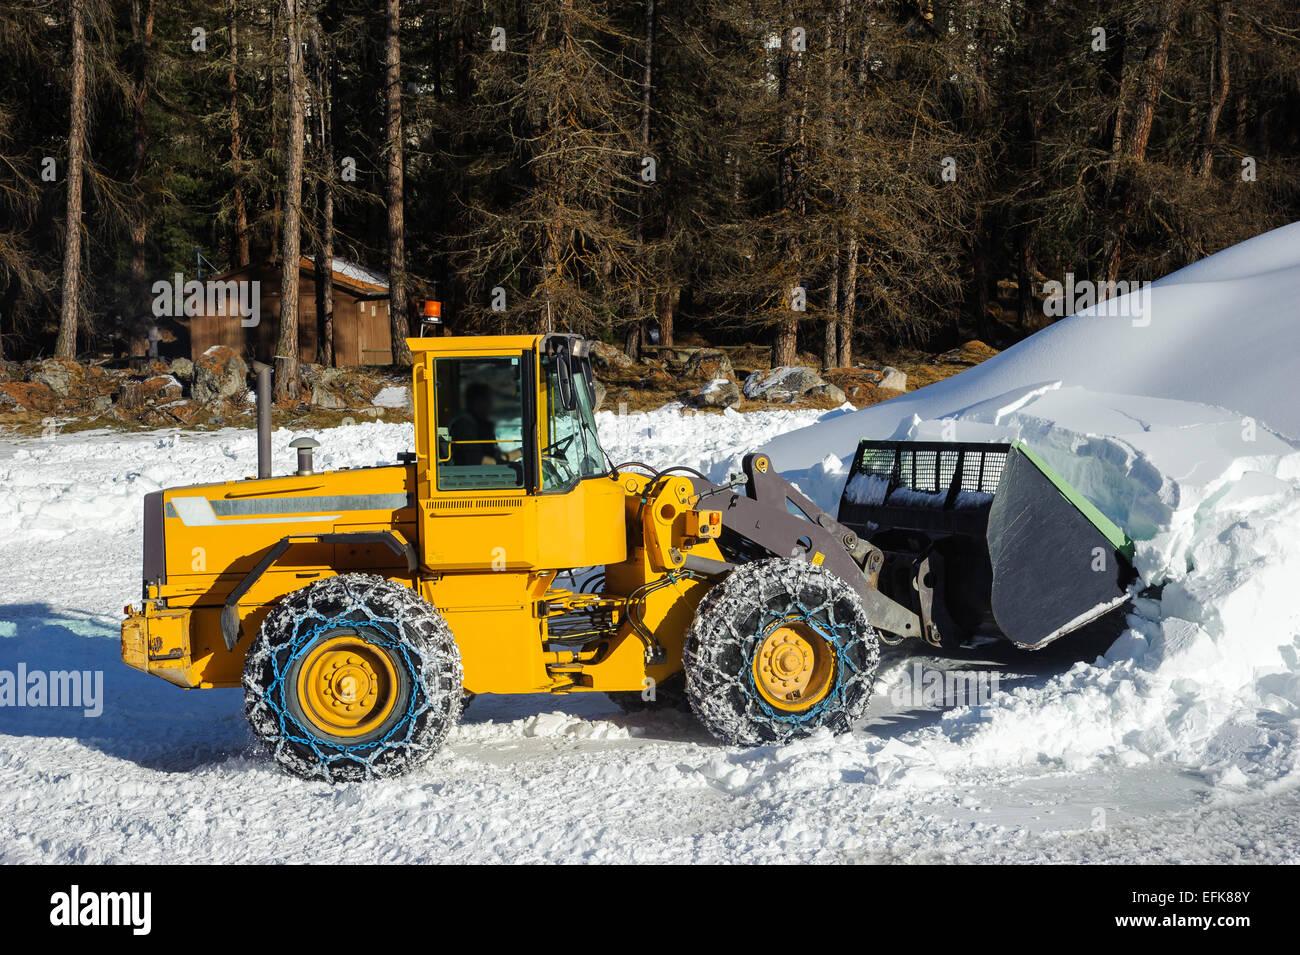 Snow removing with big bulldozer - Stock Image